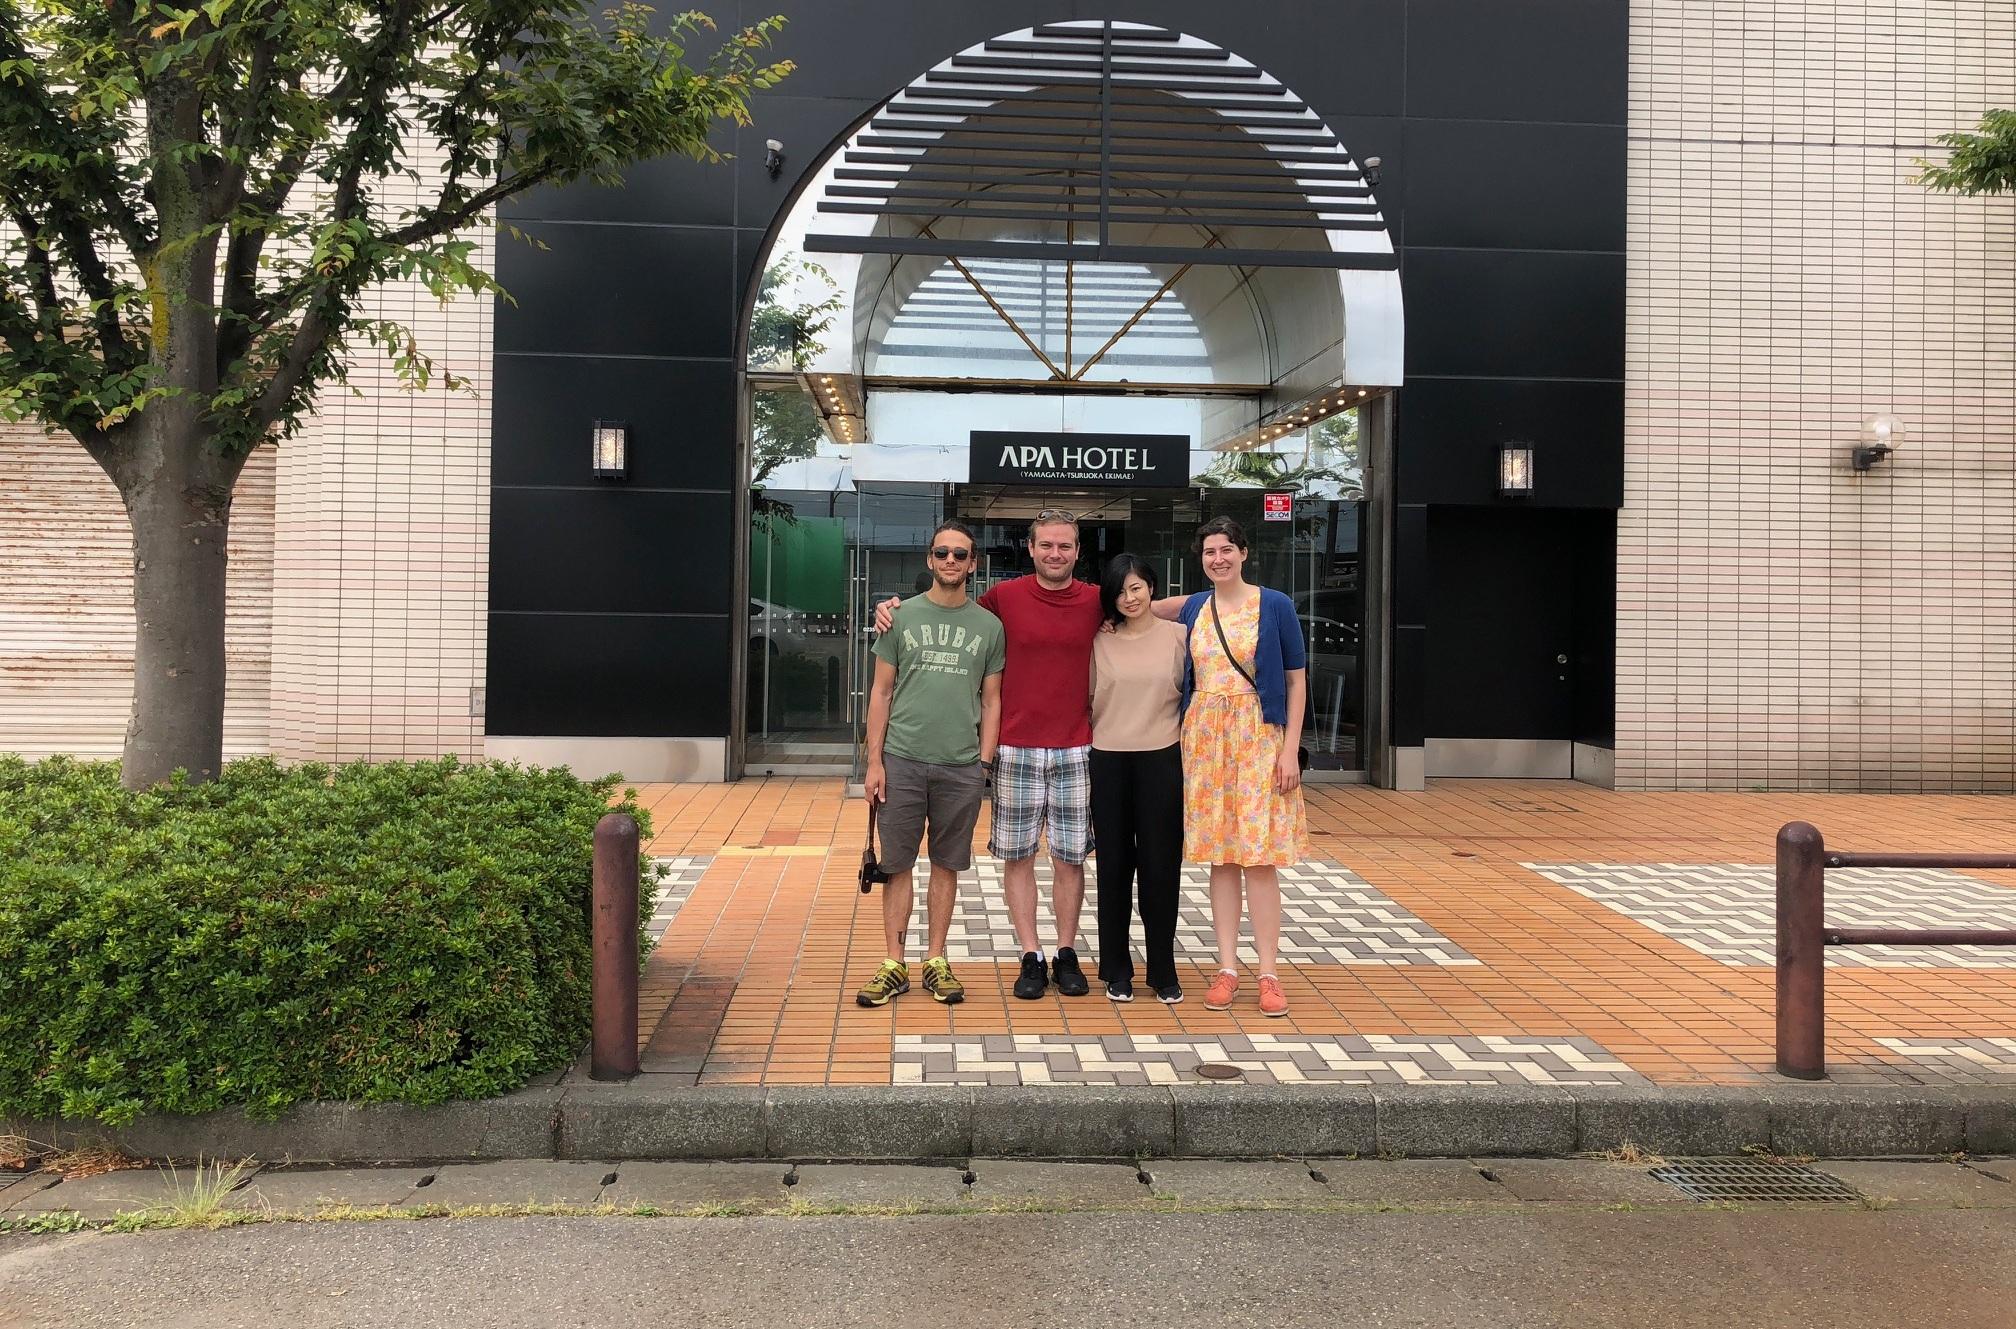 Team Tsuruoka